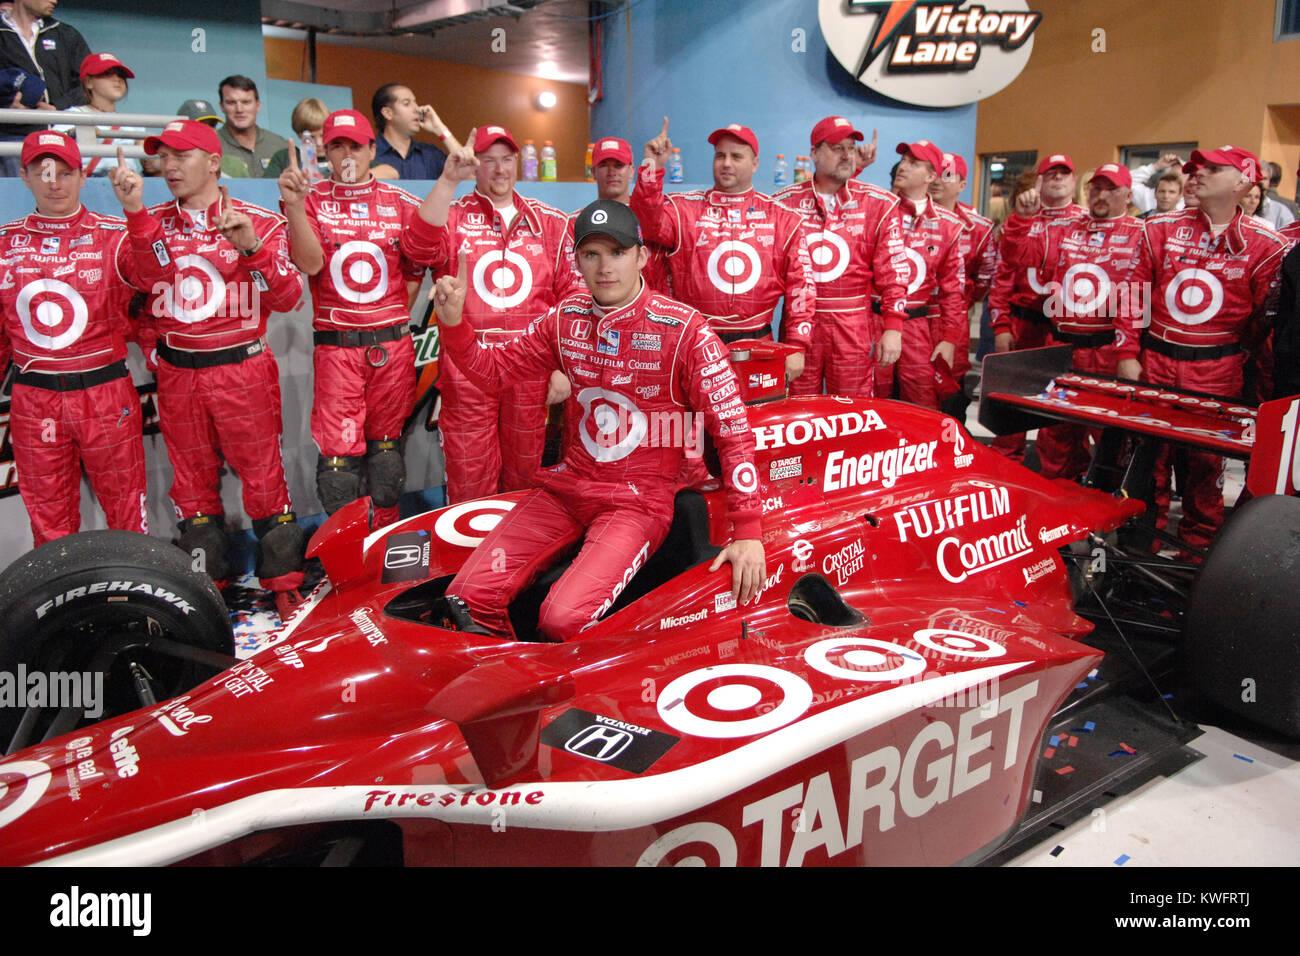 LAS VEGAS, NV - OCTOBER 16: Indianapolis 500 winner Dan Wheldon died